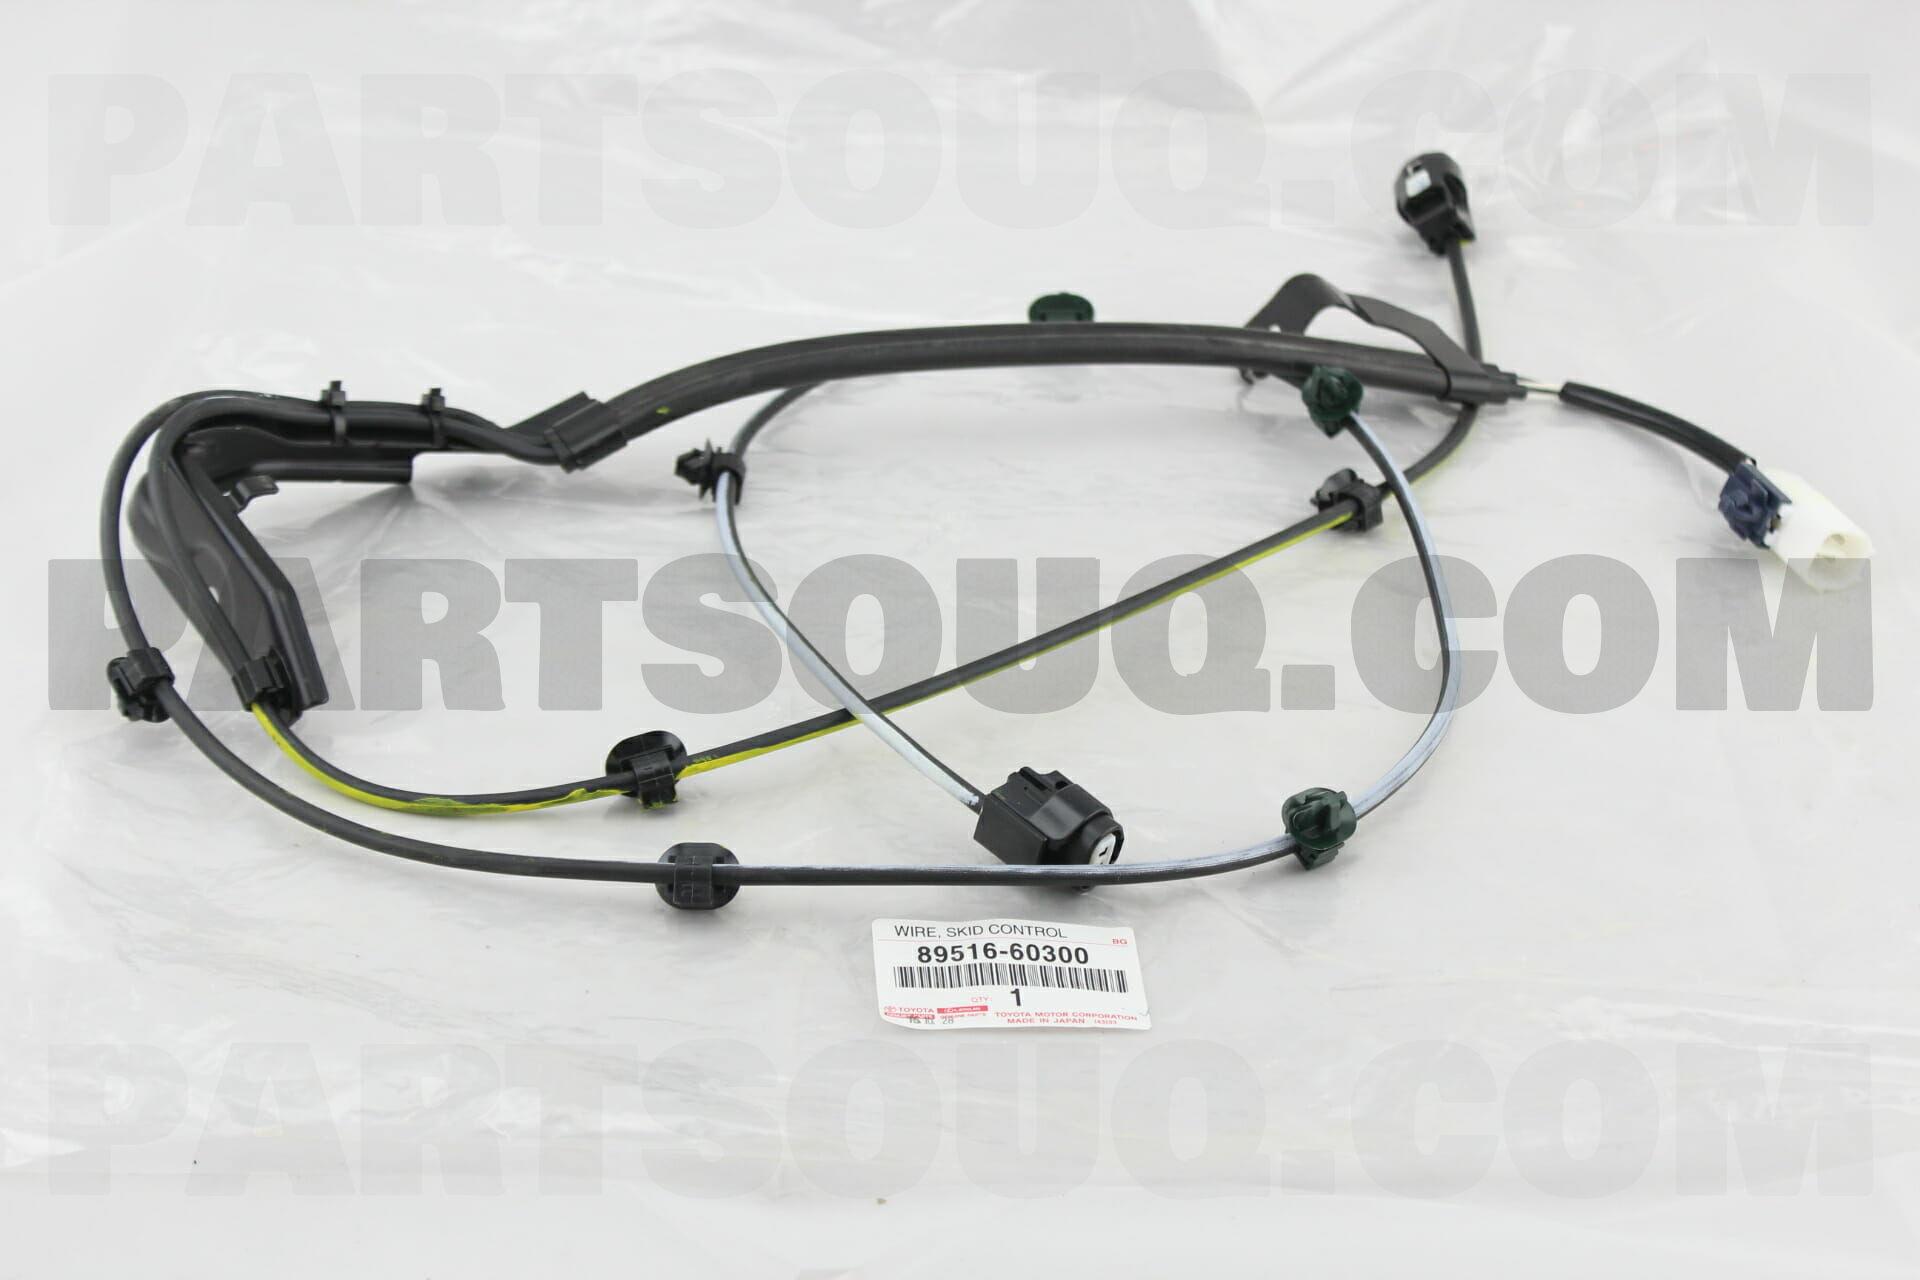 8951660300 Toyota WIRE, SKID CONTROL SENSOR Price: 64.53$, Weight ...